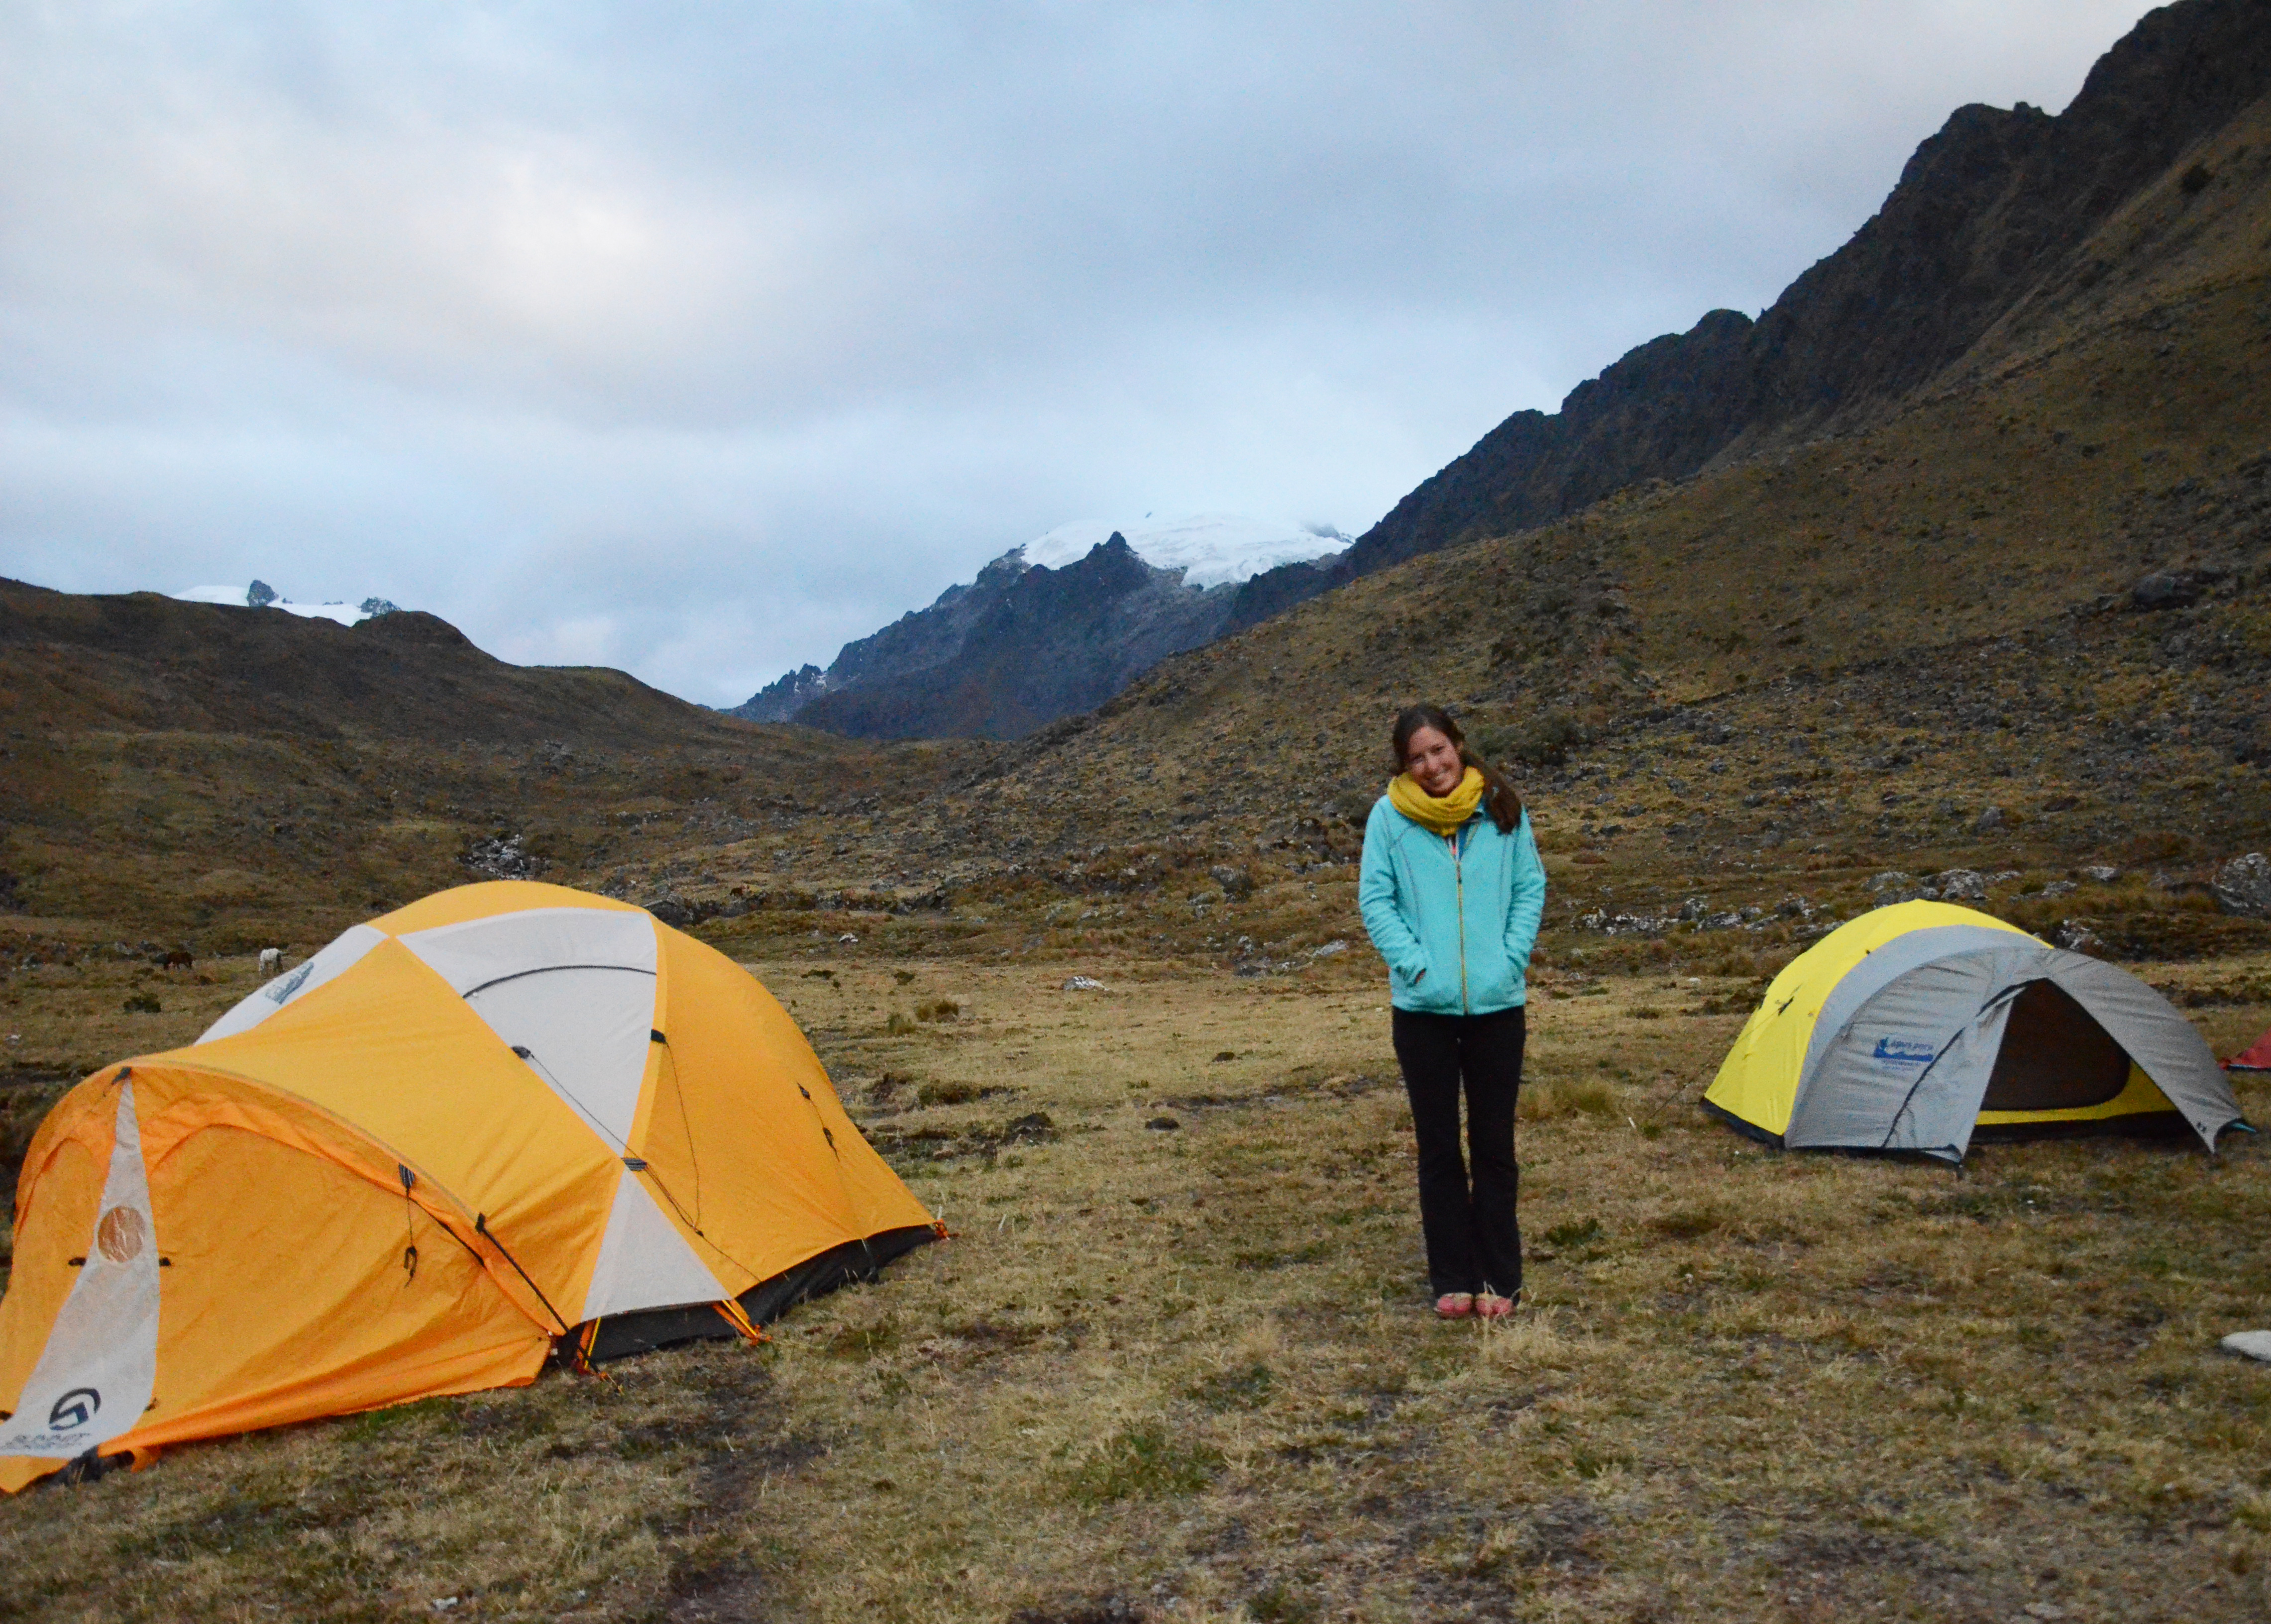 Apus Peru Blog Sustainable Amp Ethical Trekking In Peru